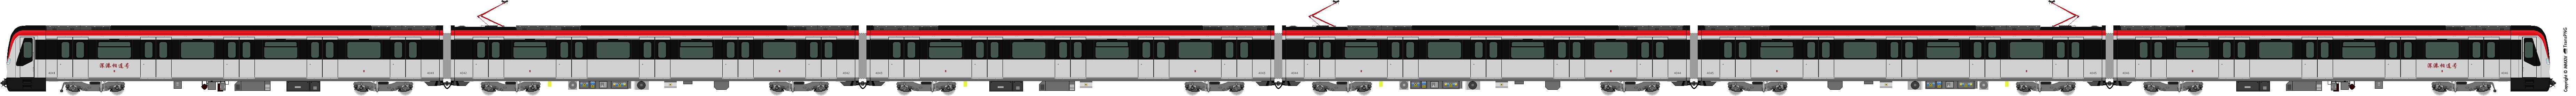 [5398] 港鉄軌道交通(深セン) 5398